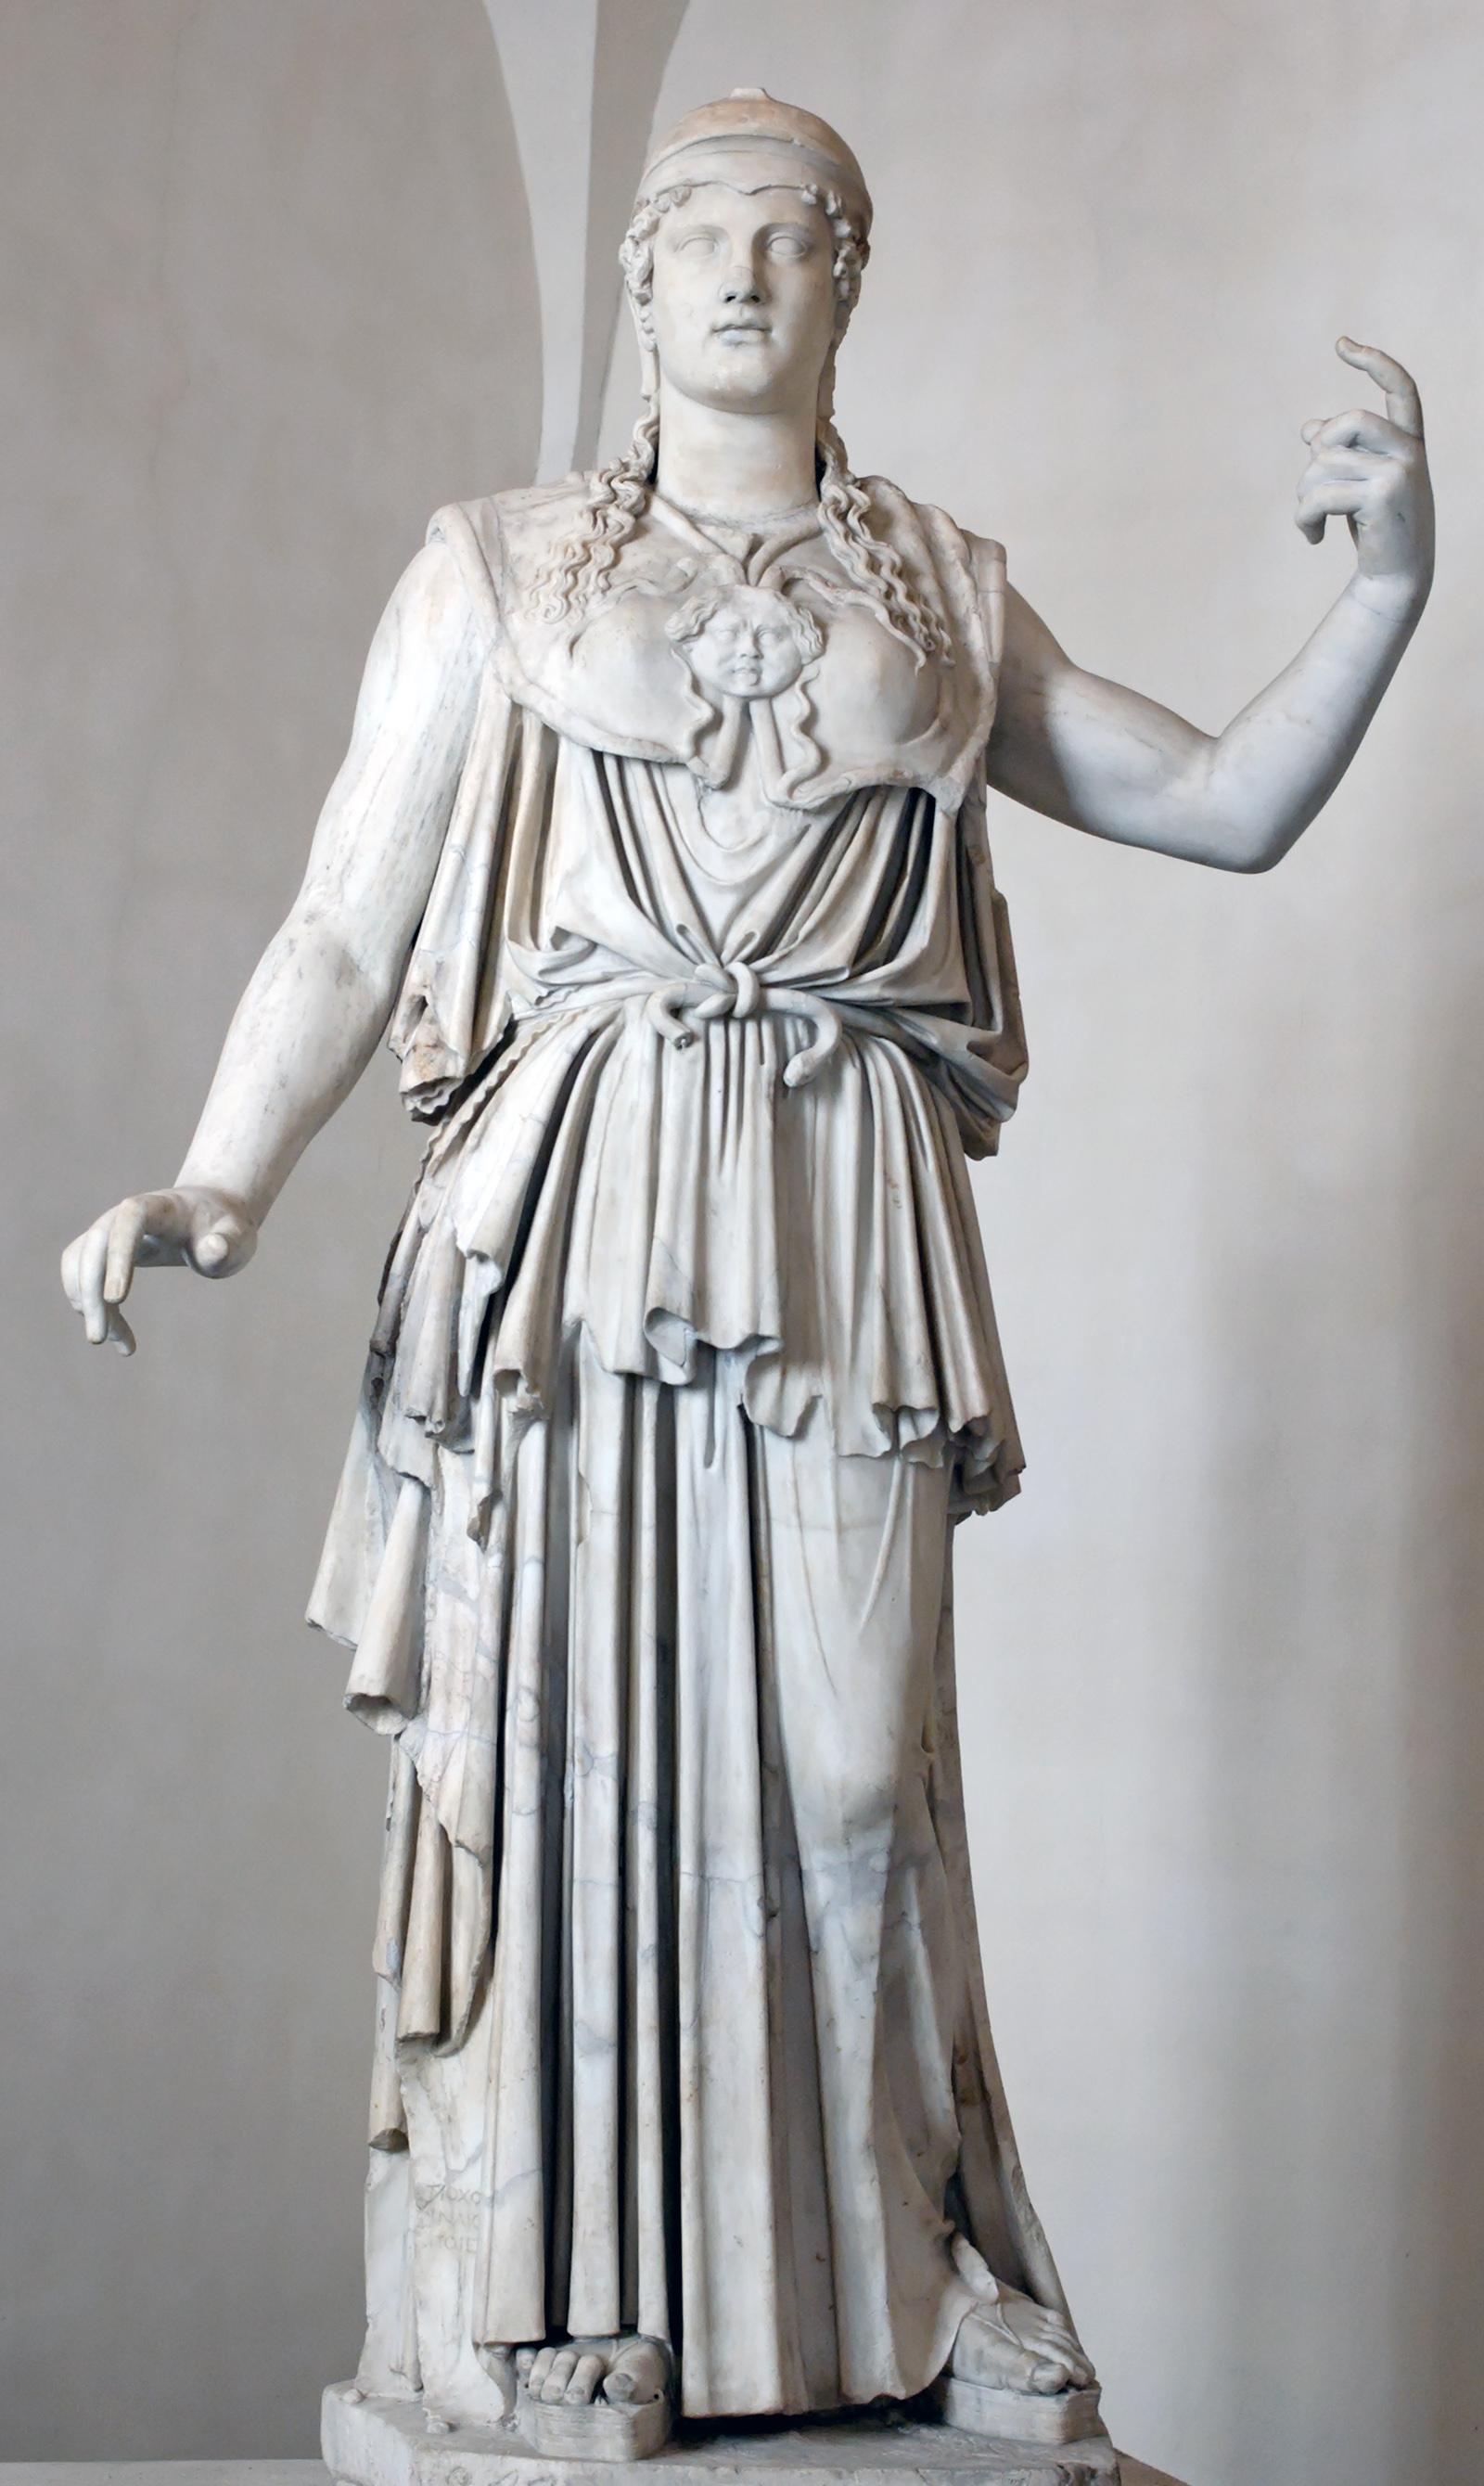 https://i1.wp.com/upload.wikimedia.org/wikipedia/commons/d/db/Athena_Parthenos_Altemps_Inv8622.jpg